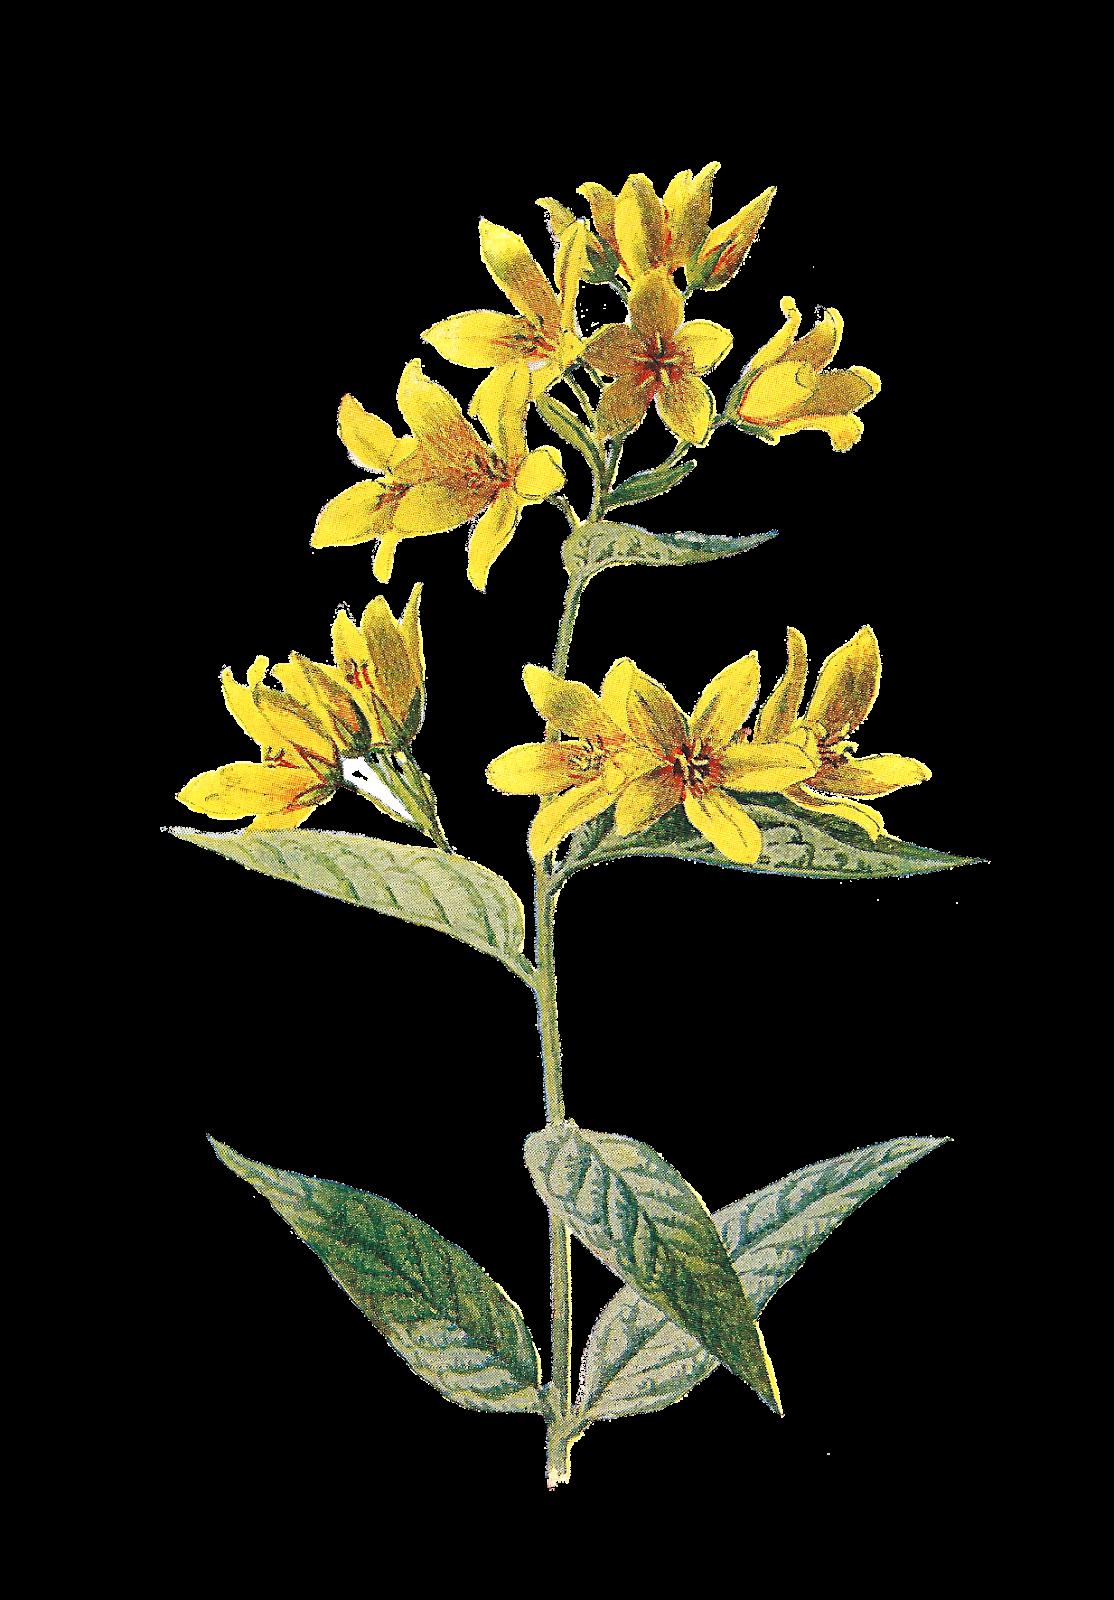 Antique images free digital. Wild flower png